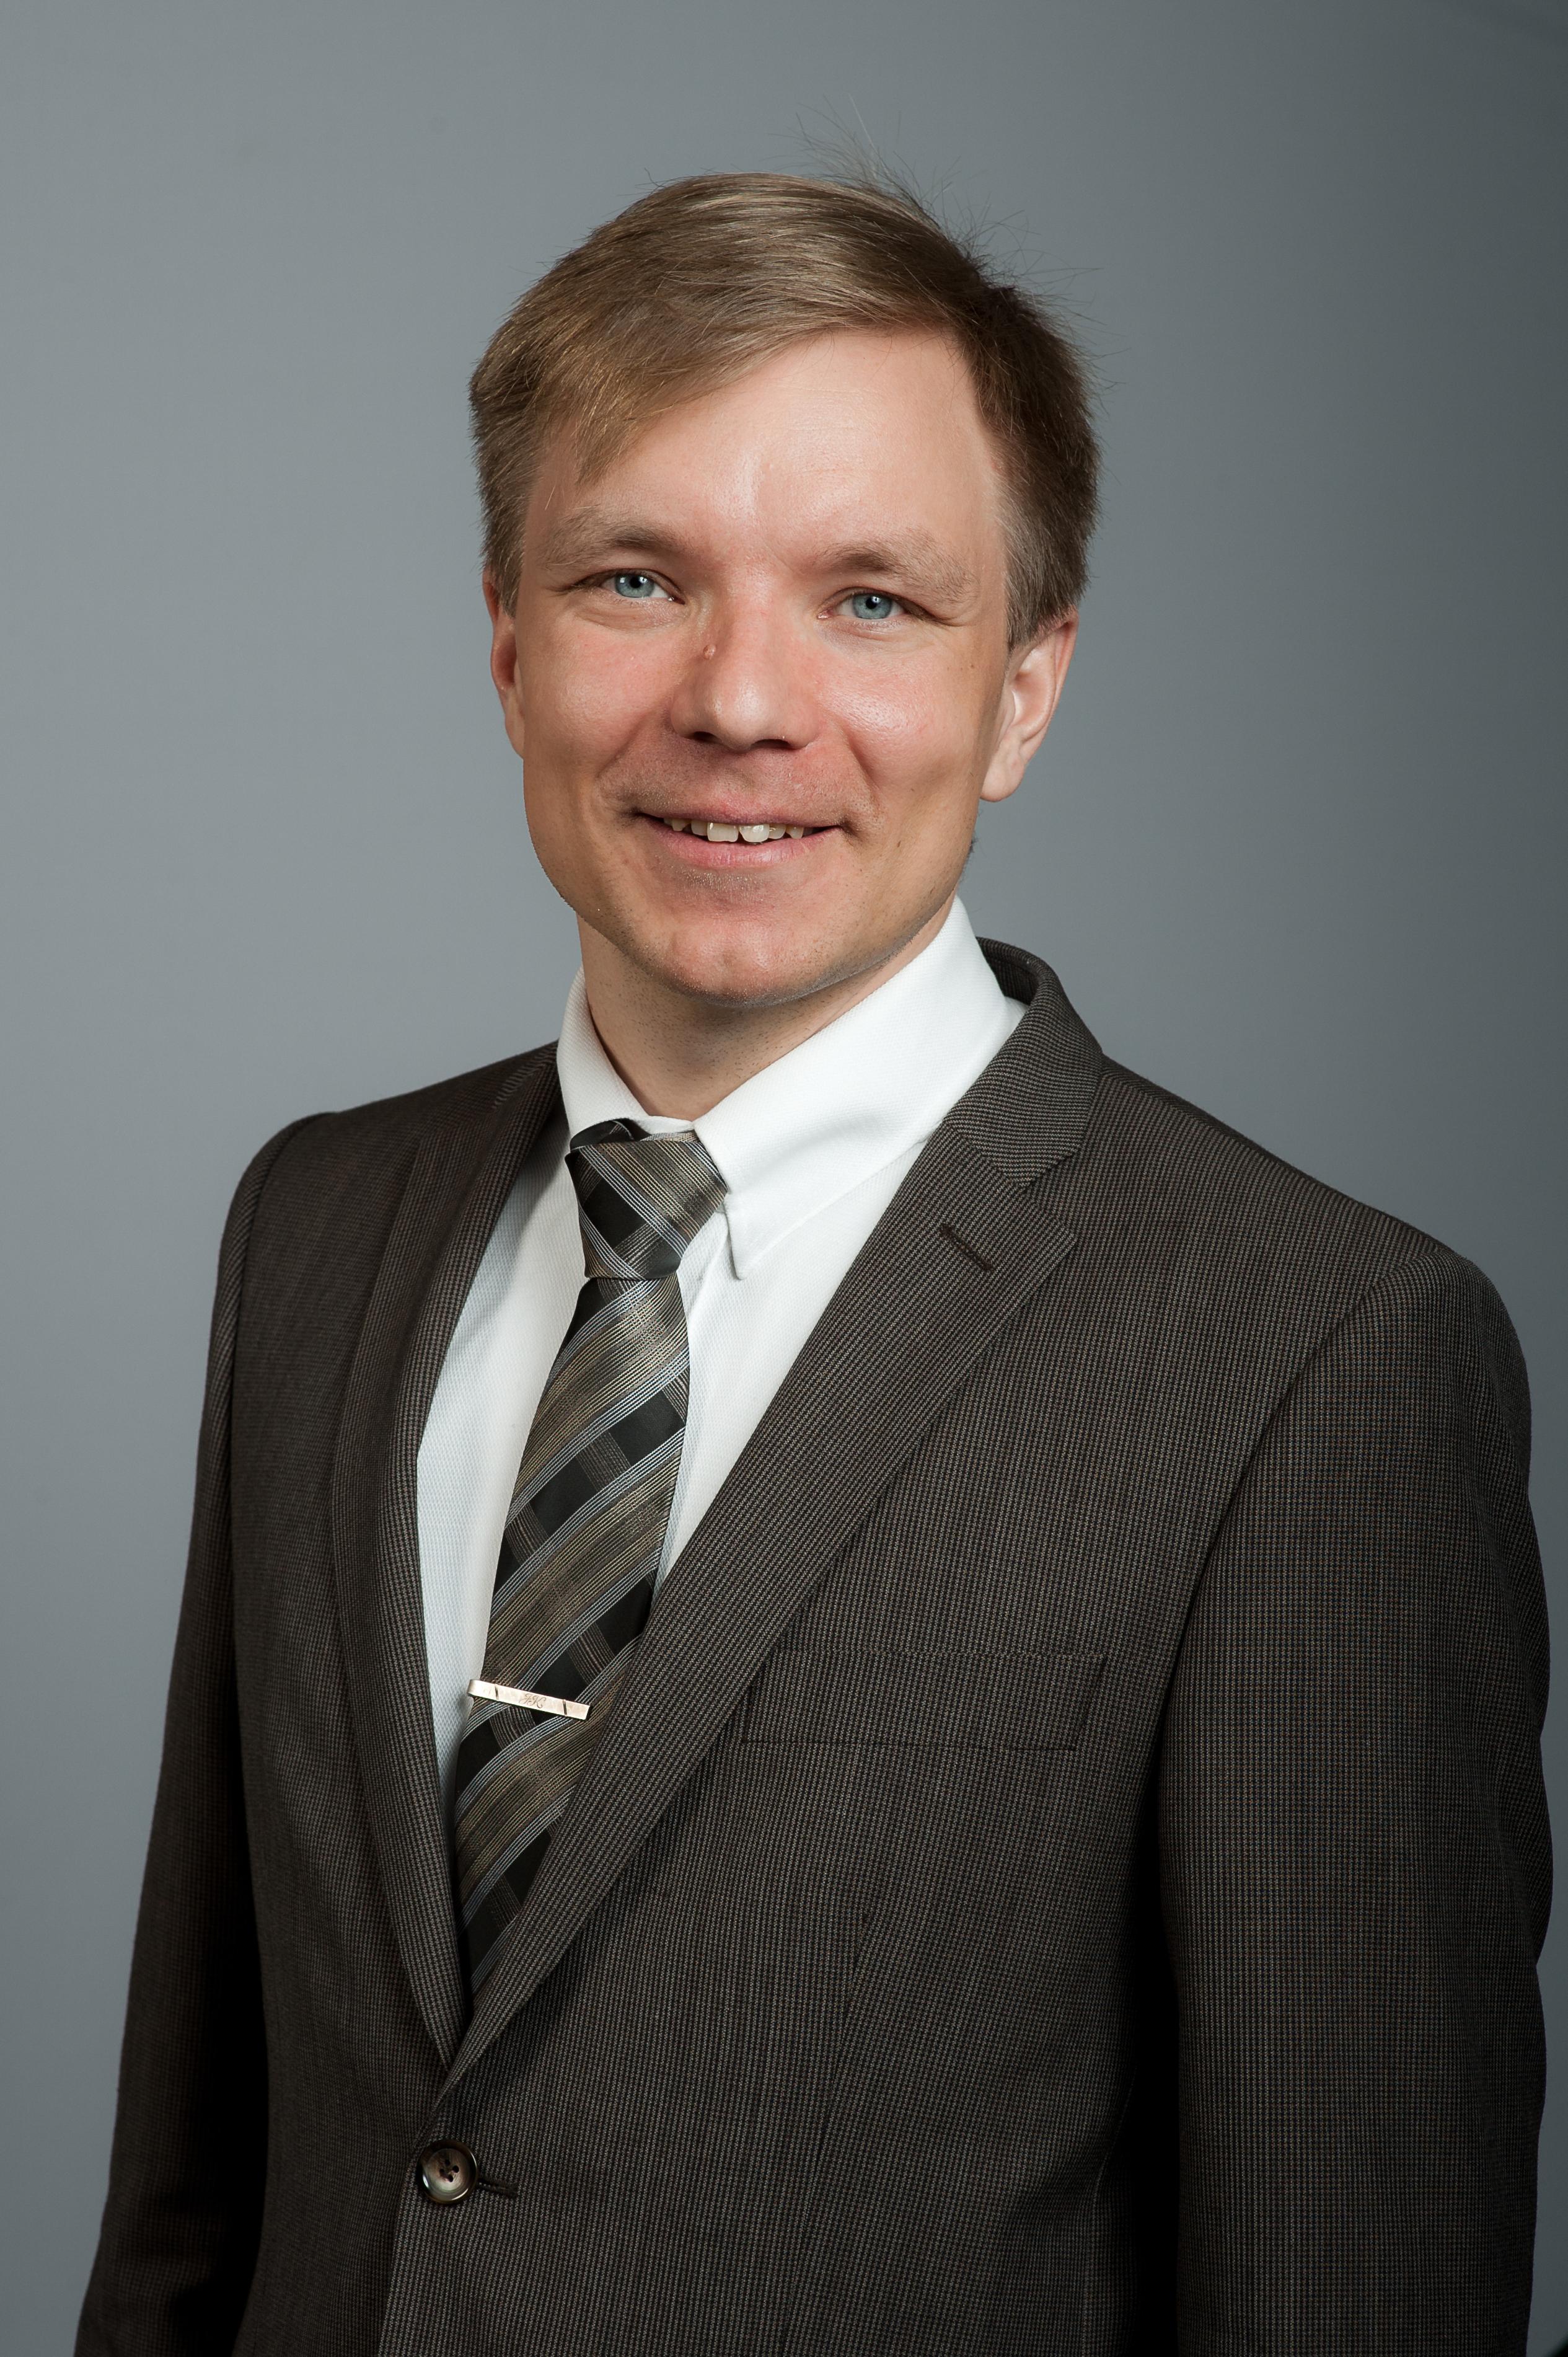 Markus Oksa